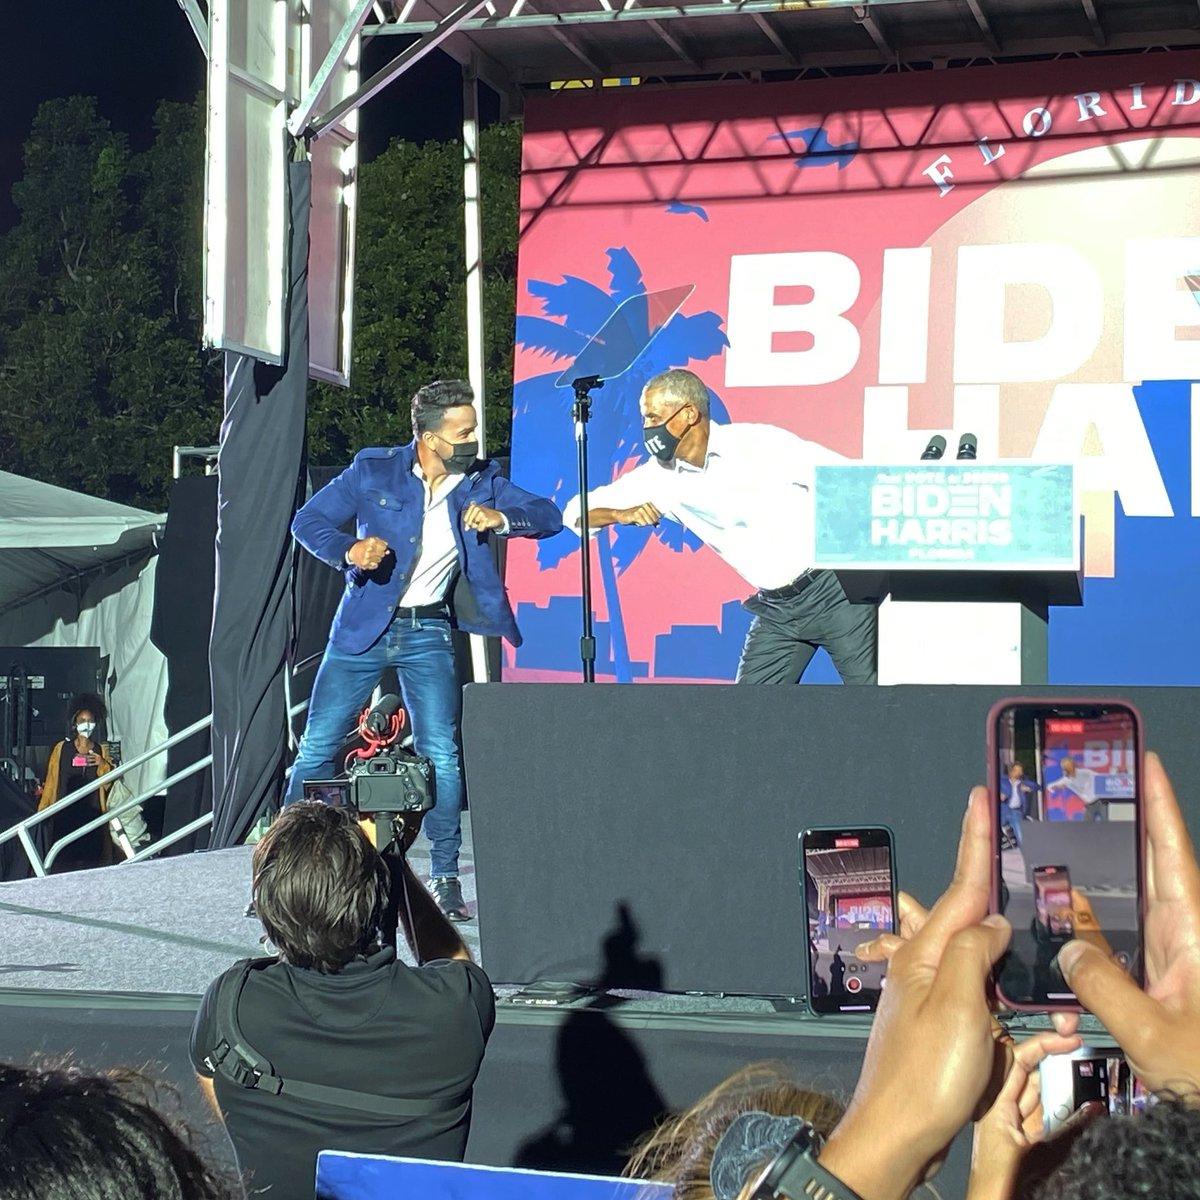 Such an honor to share the stage with a true leader @barackobama Un honor compartir escenario con un verdadero líder 🙌🏽. #Vote #BidenHarris2020